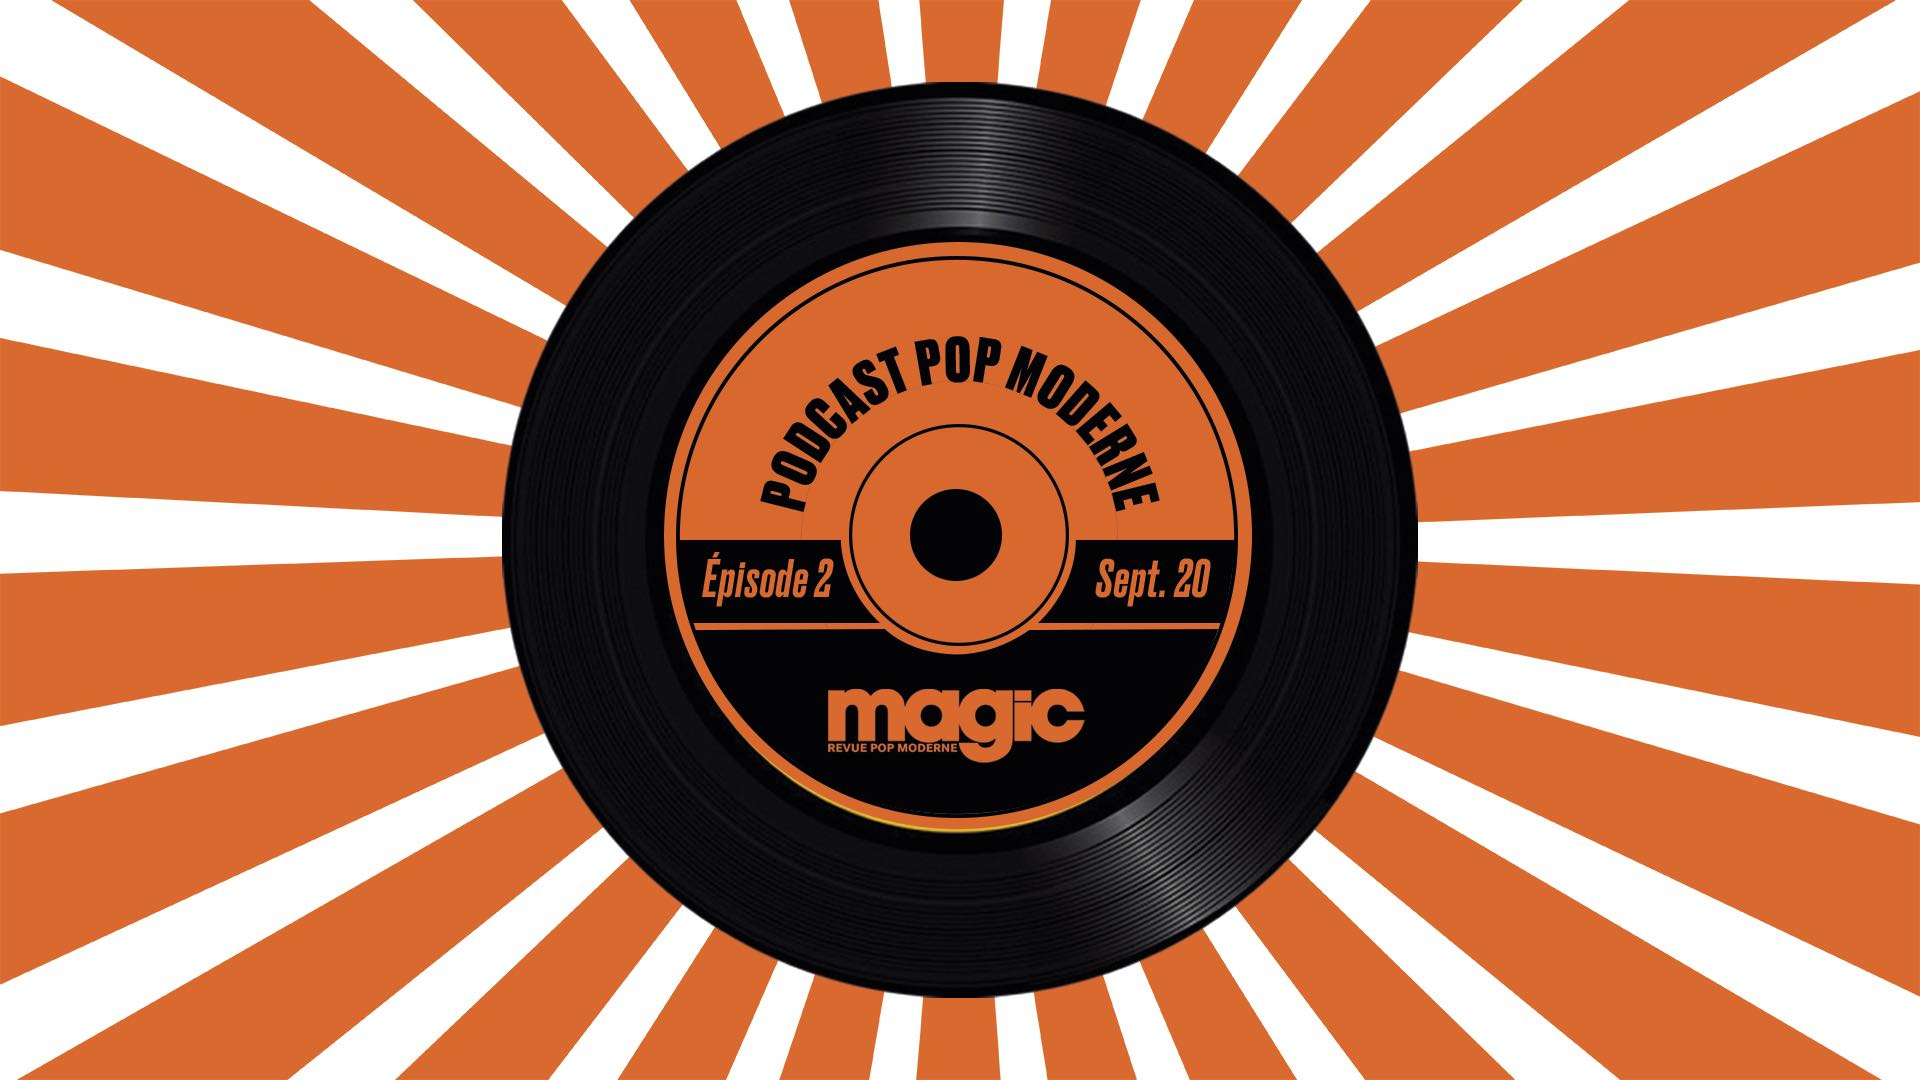 Popcast pop moderne #2